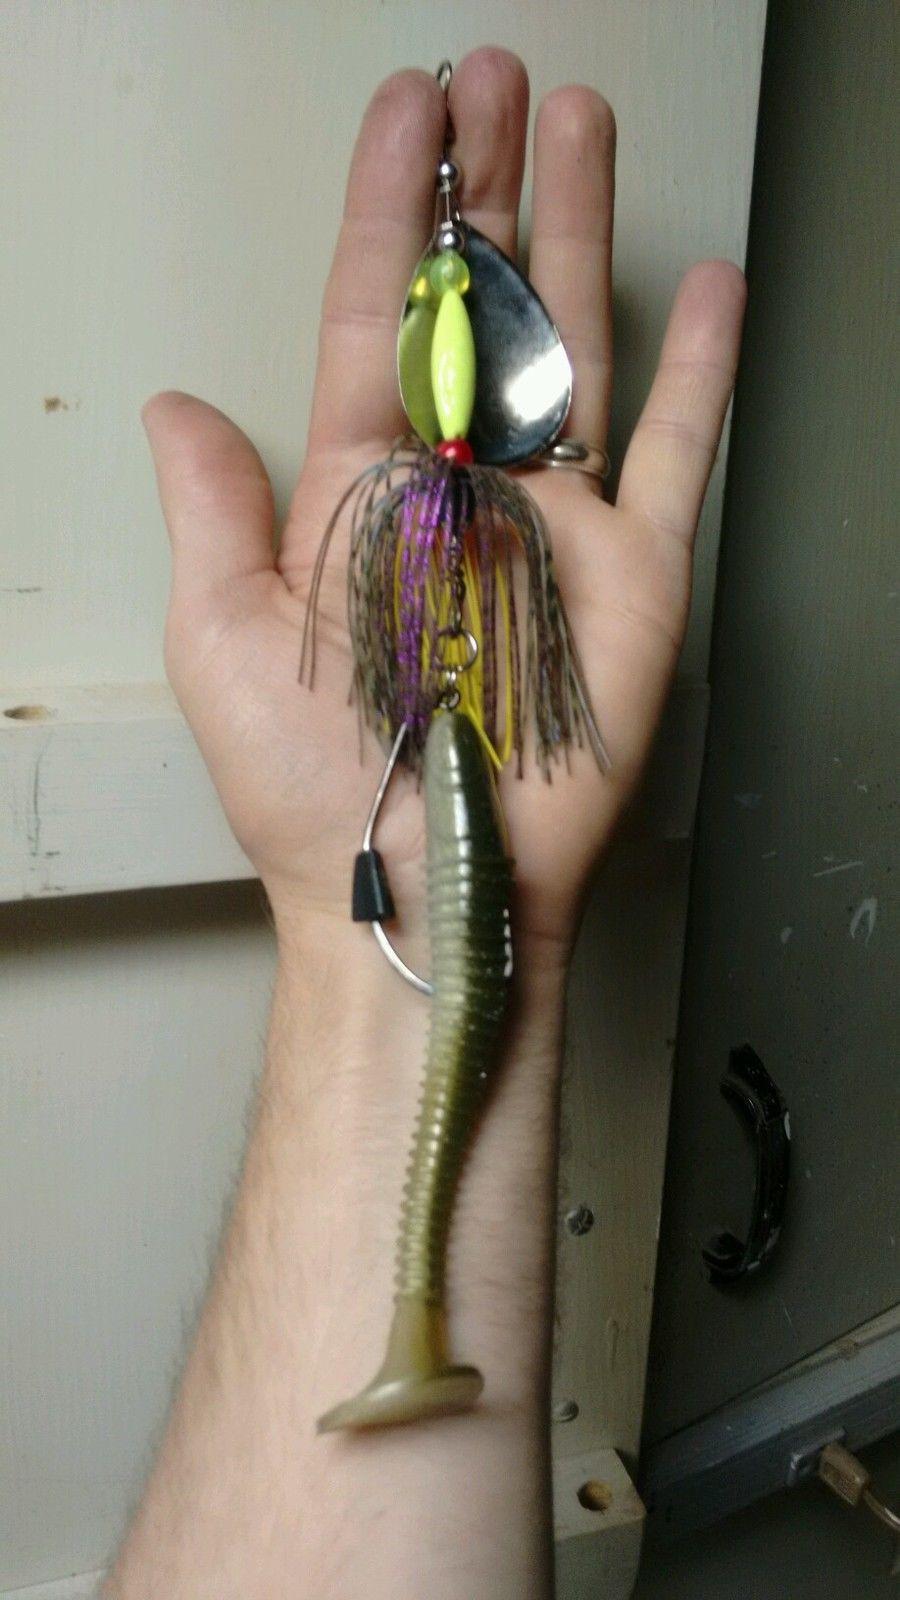 Cikade Hegene Pike and Zander Njord Kalastus Lead Head Spinner Fishing Lure Spinner Bait Set 13g Jig Spinner Perch Crankbait with Drilling Trout